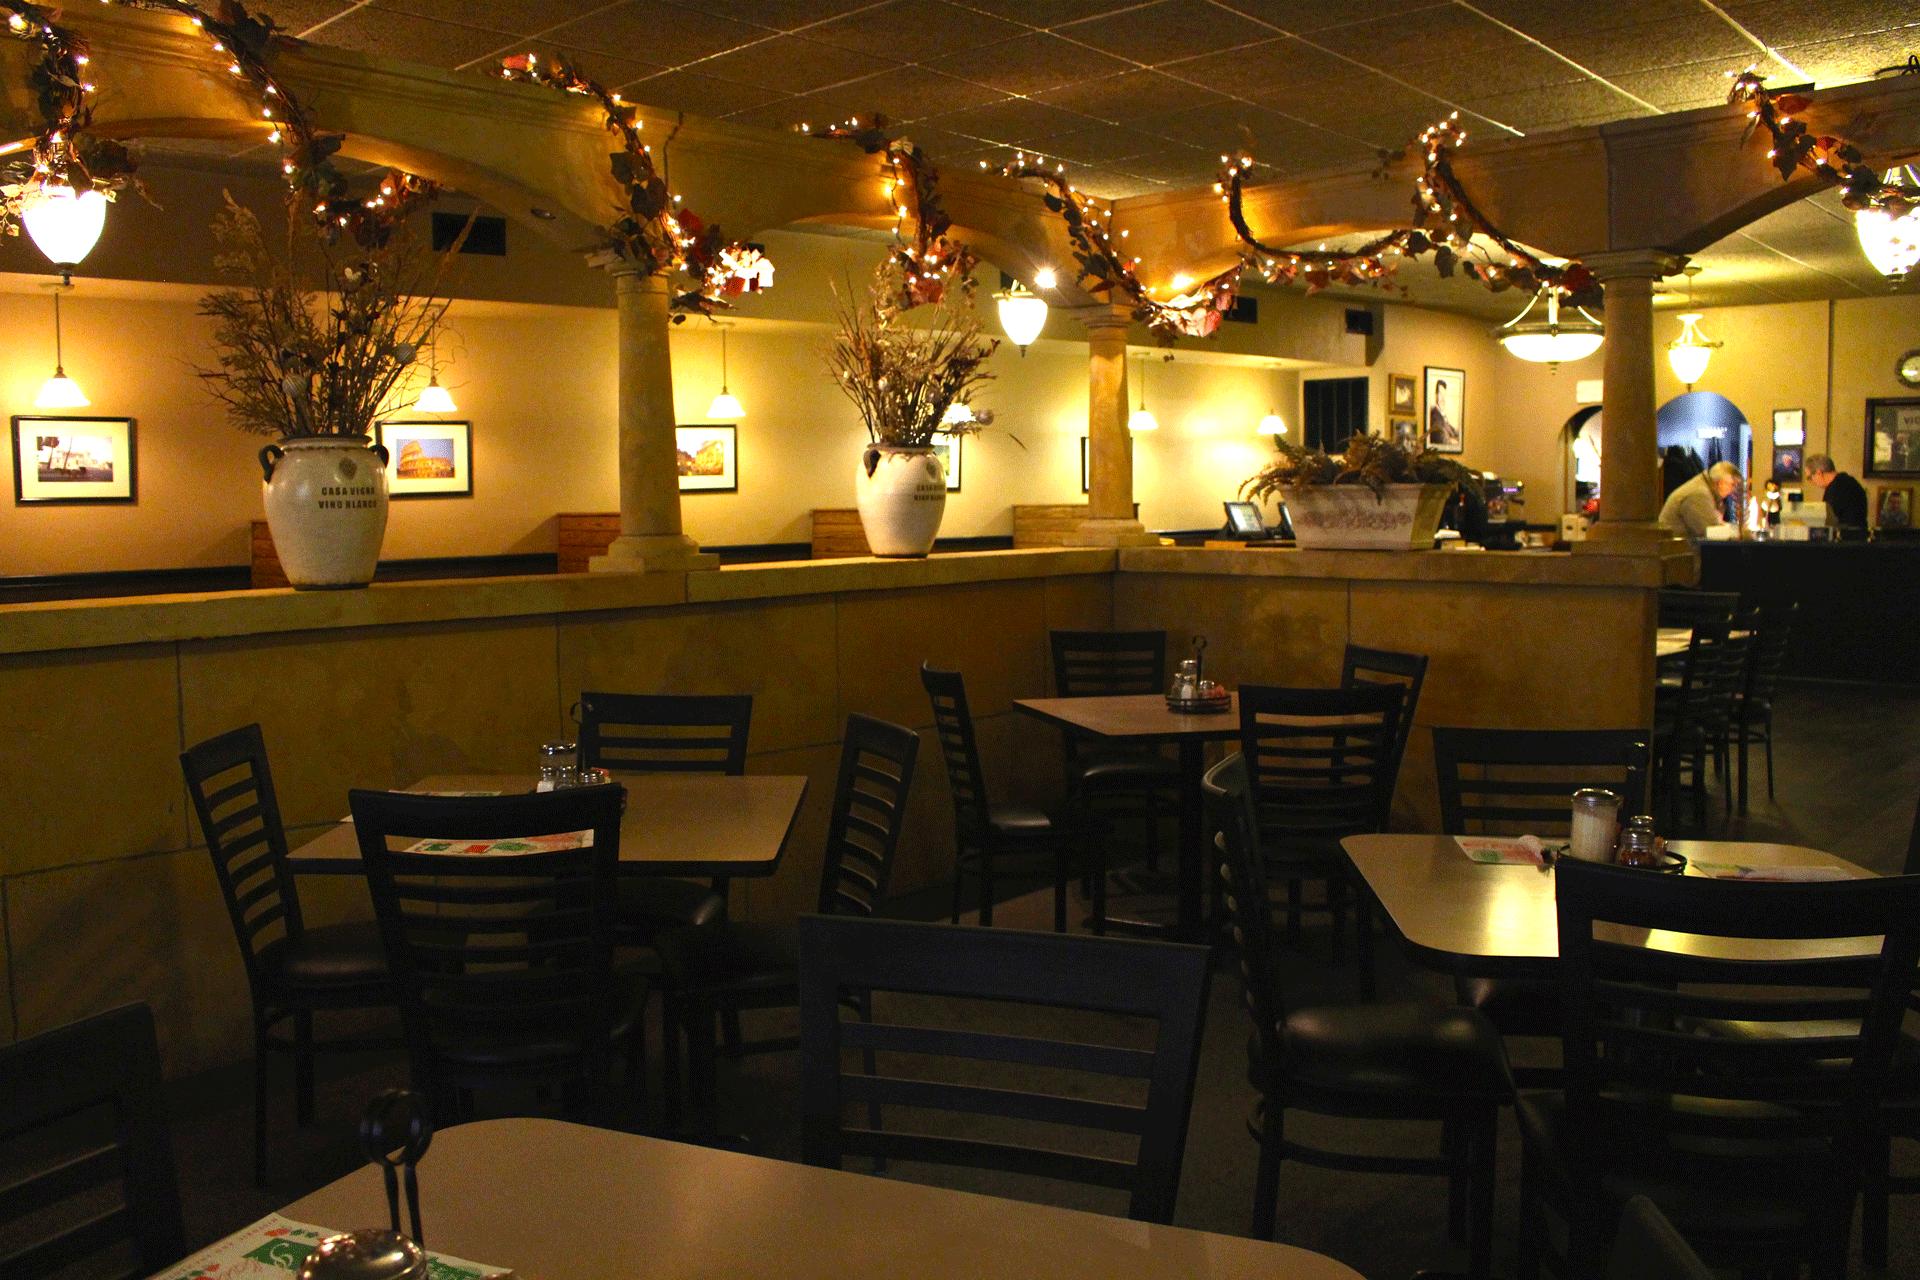 Mario's dining area